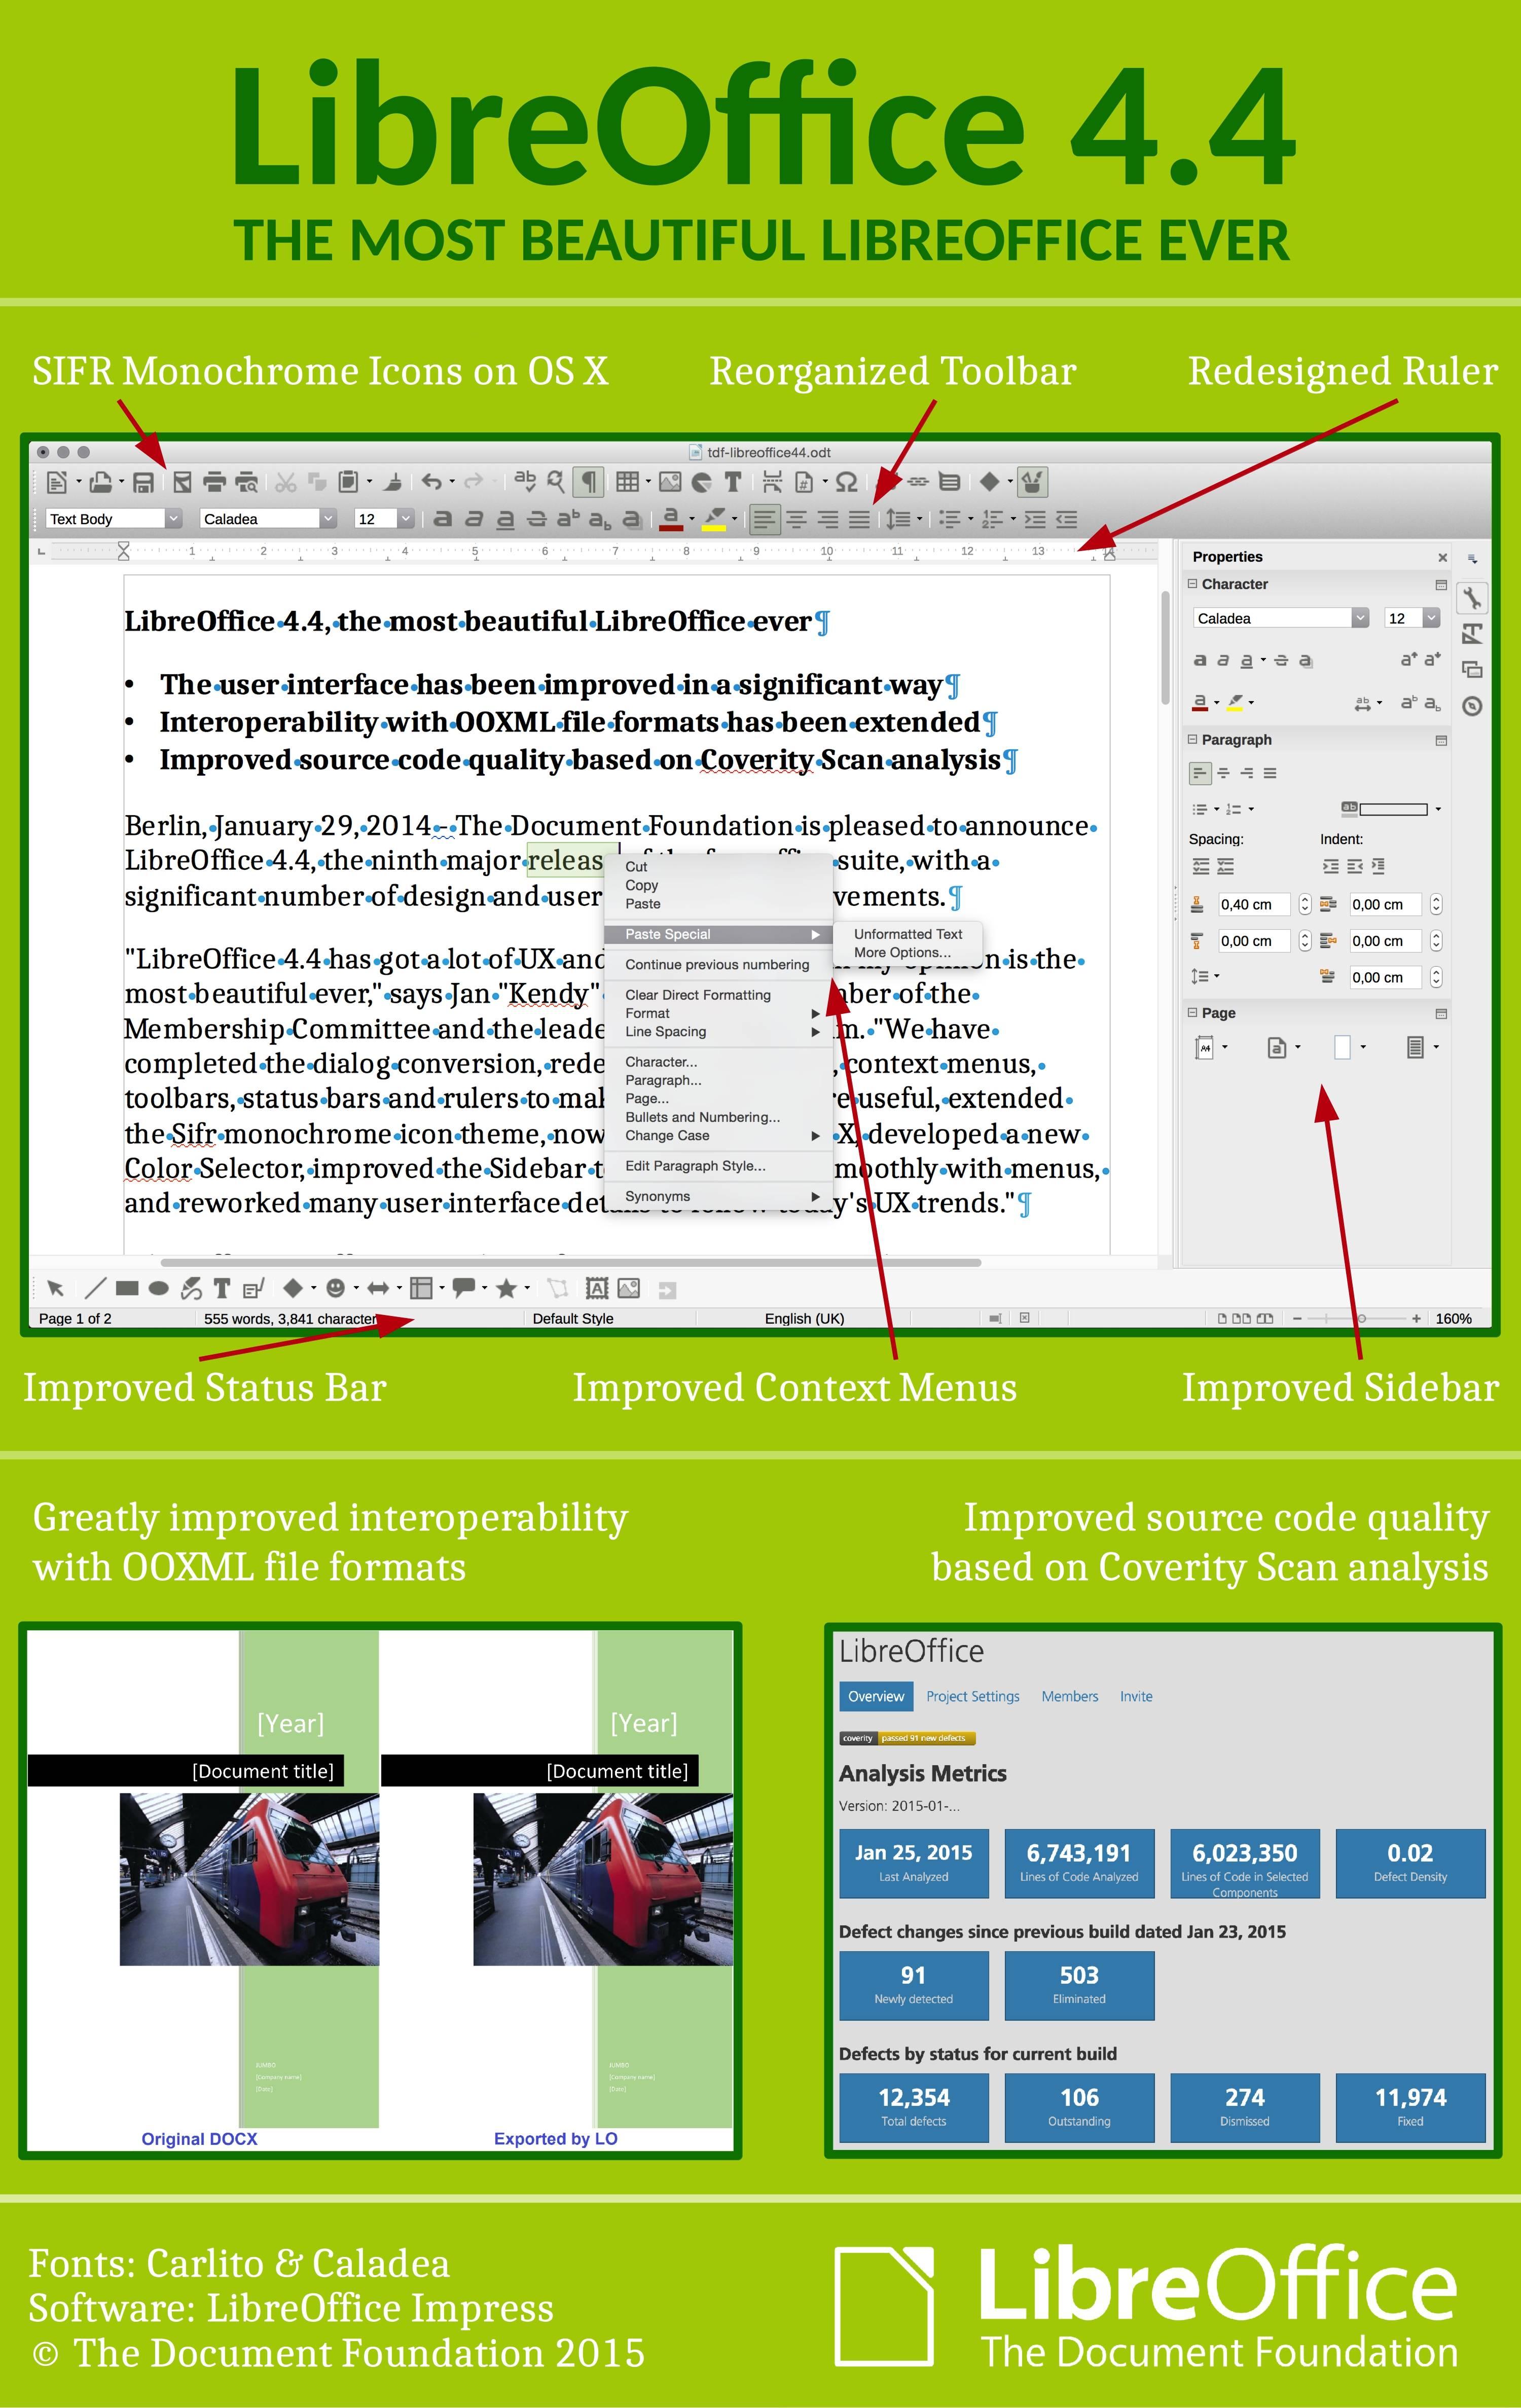 LibreOffice 4.4 Features on Ubuntu